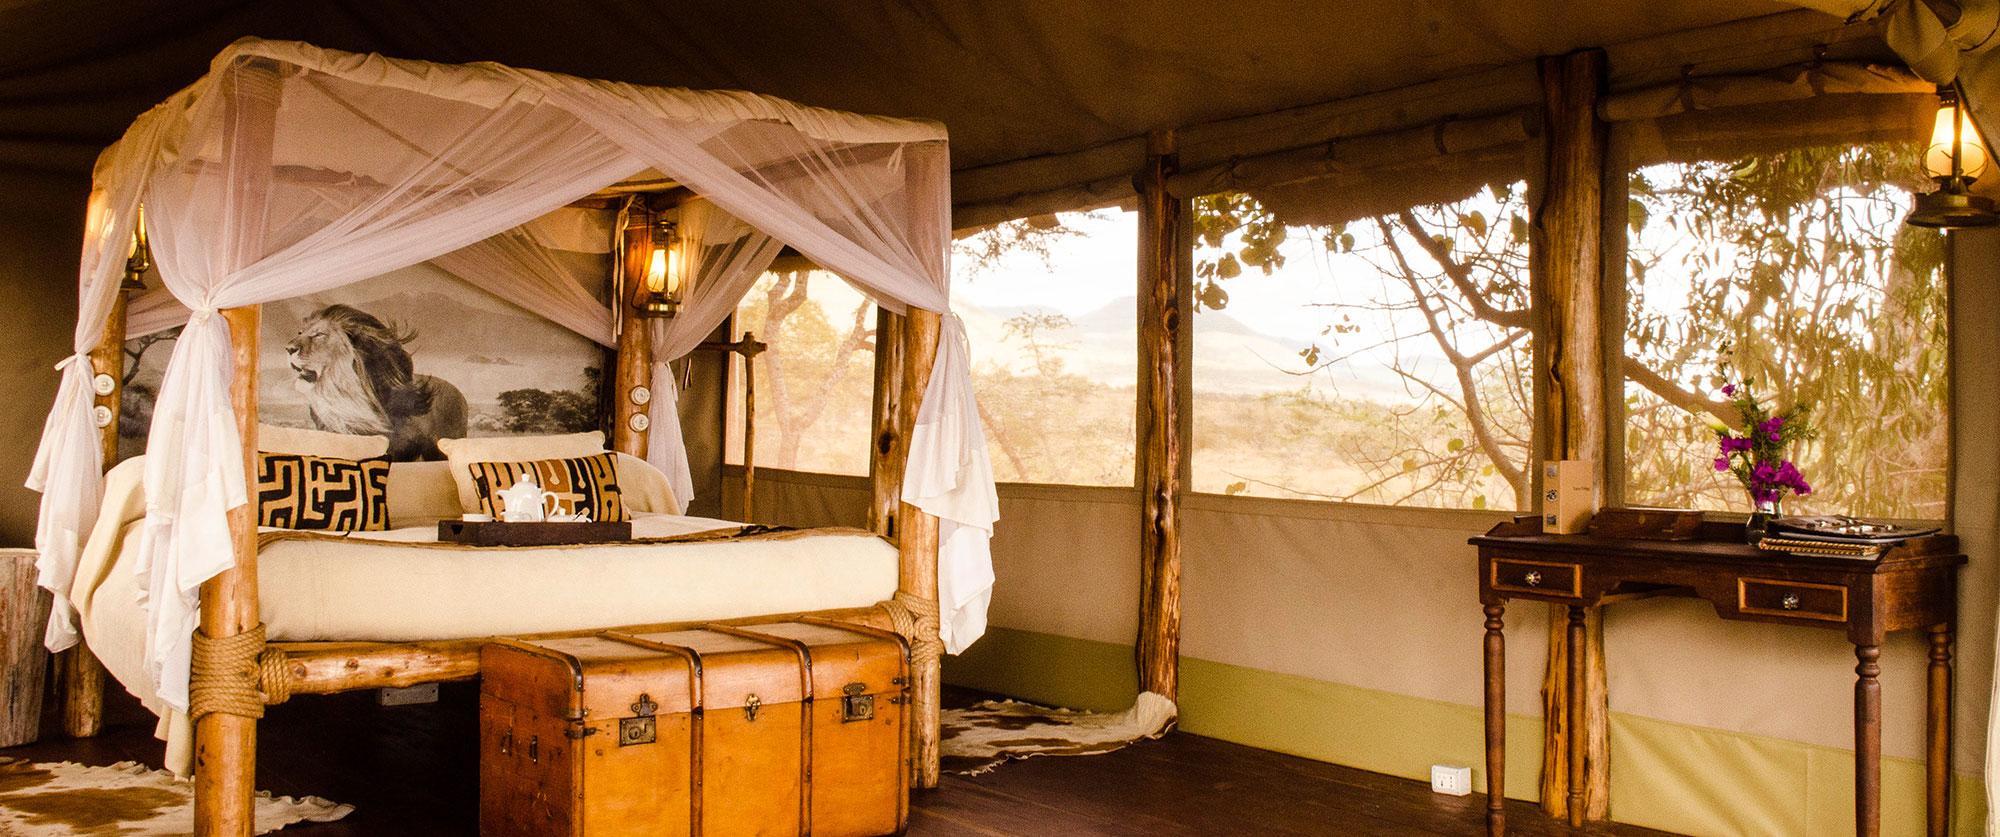 Wildlife Safari in Kenya - Campi ya Kanzi